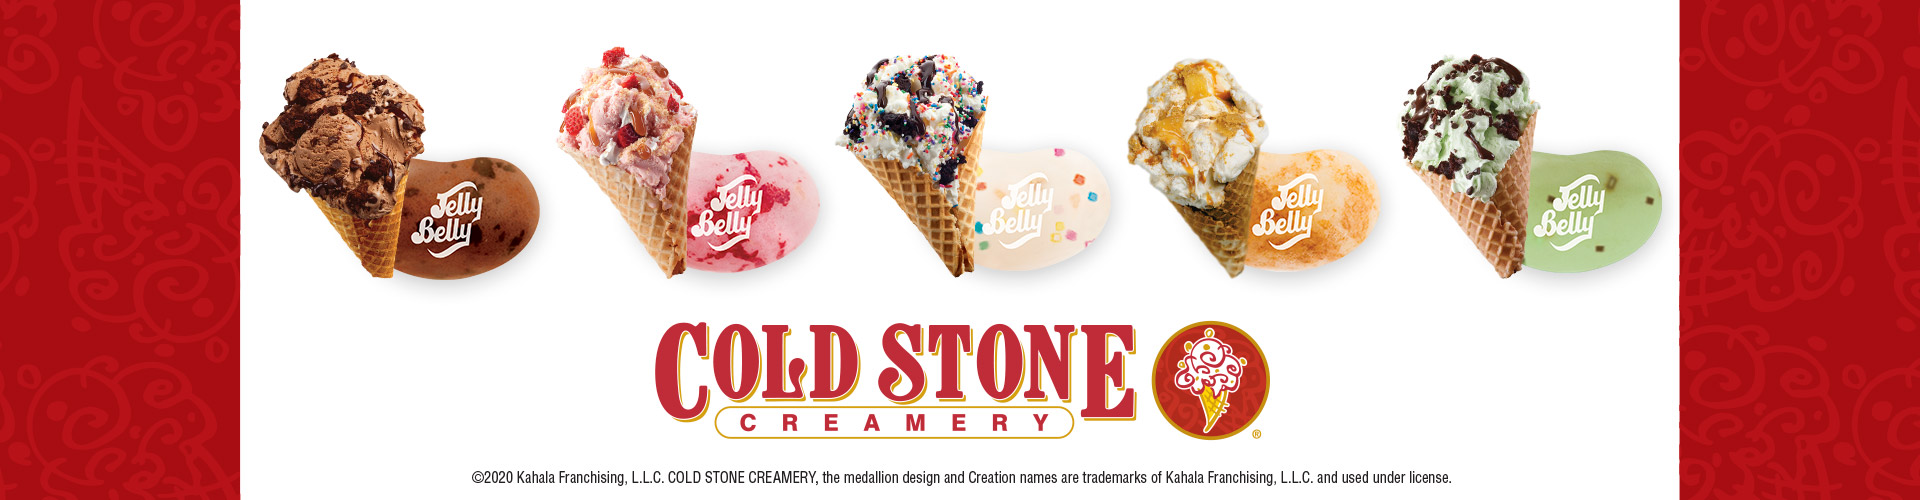 Cold Stone Ice Cream Parlor Mix